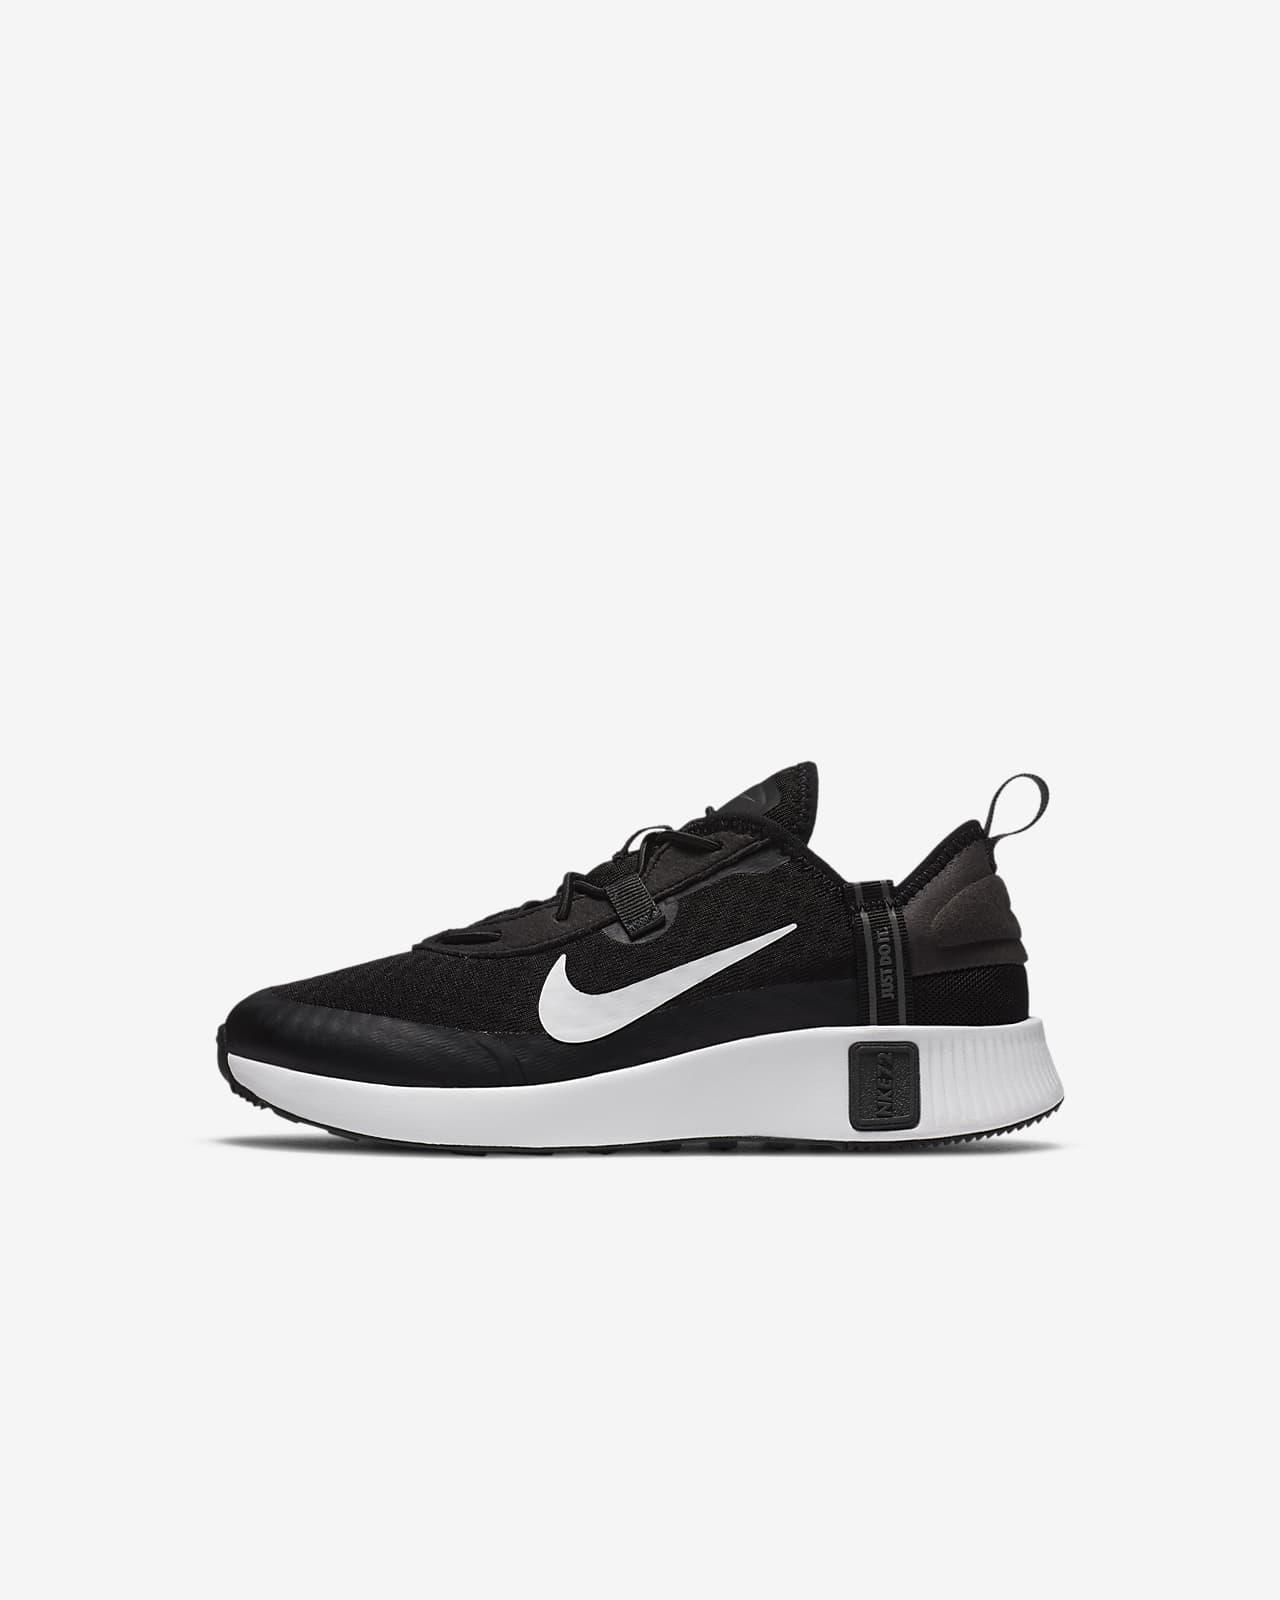 Nike Reposto Little Kids' Shoes